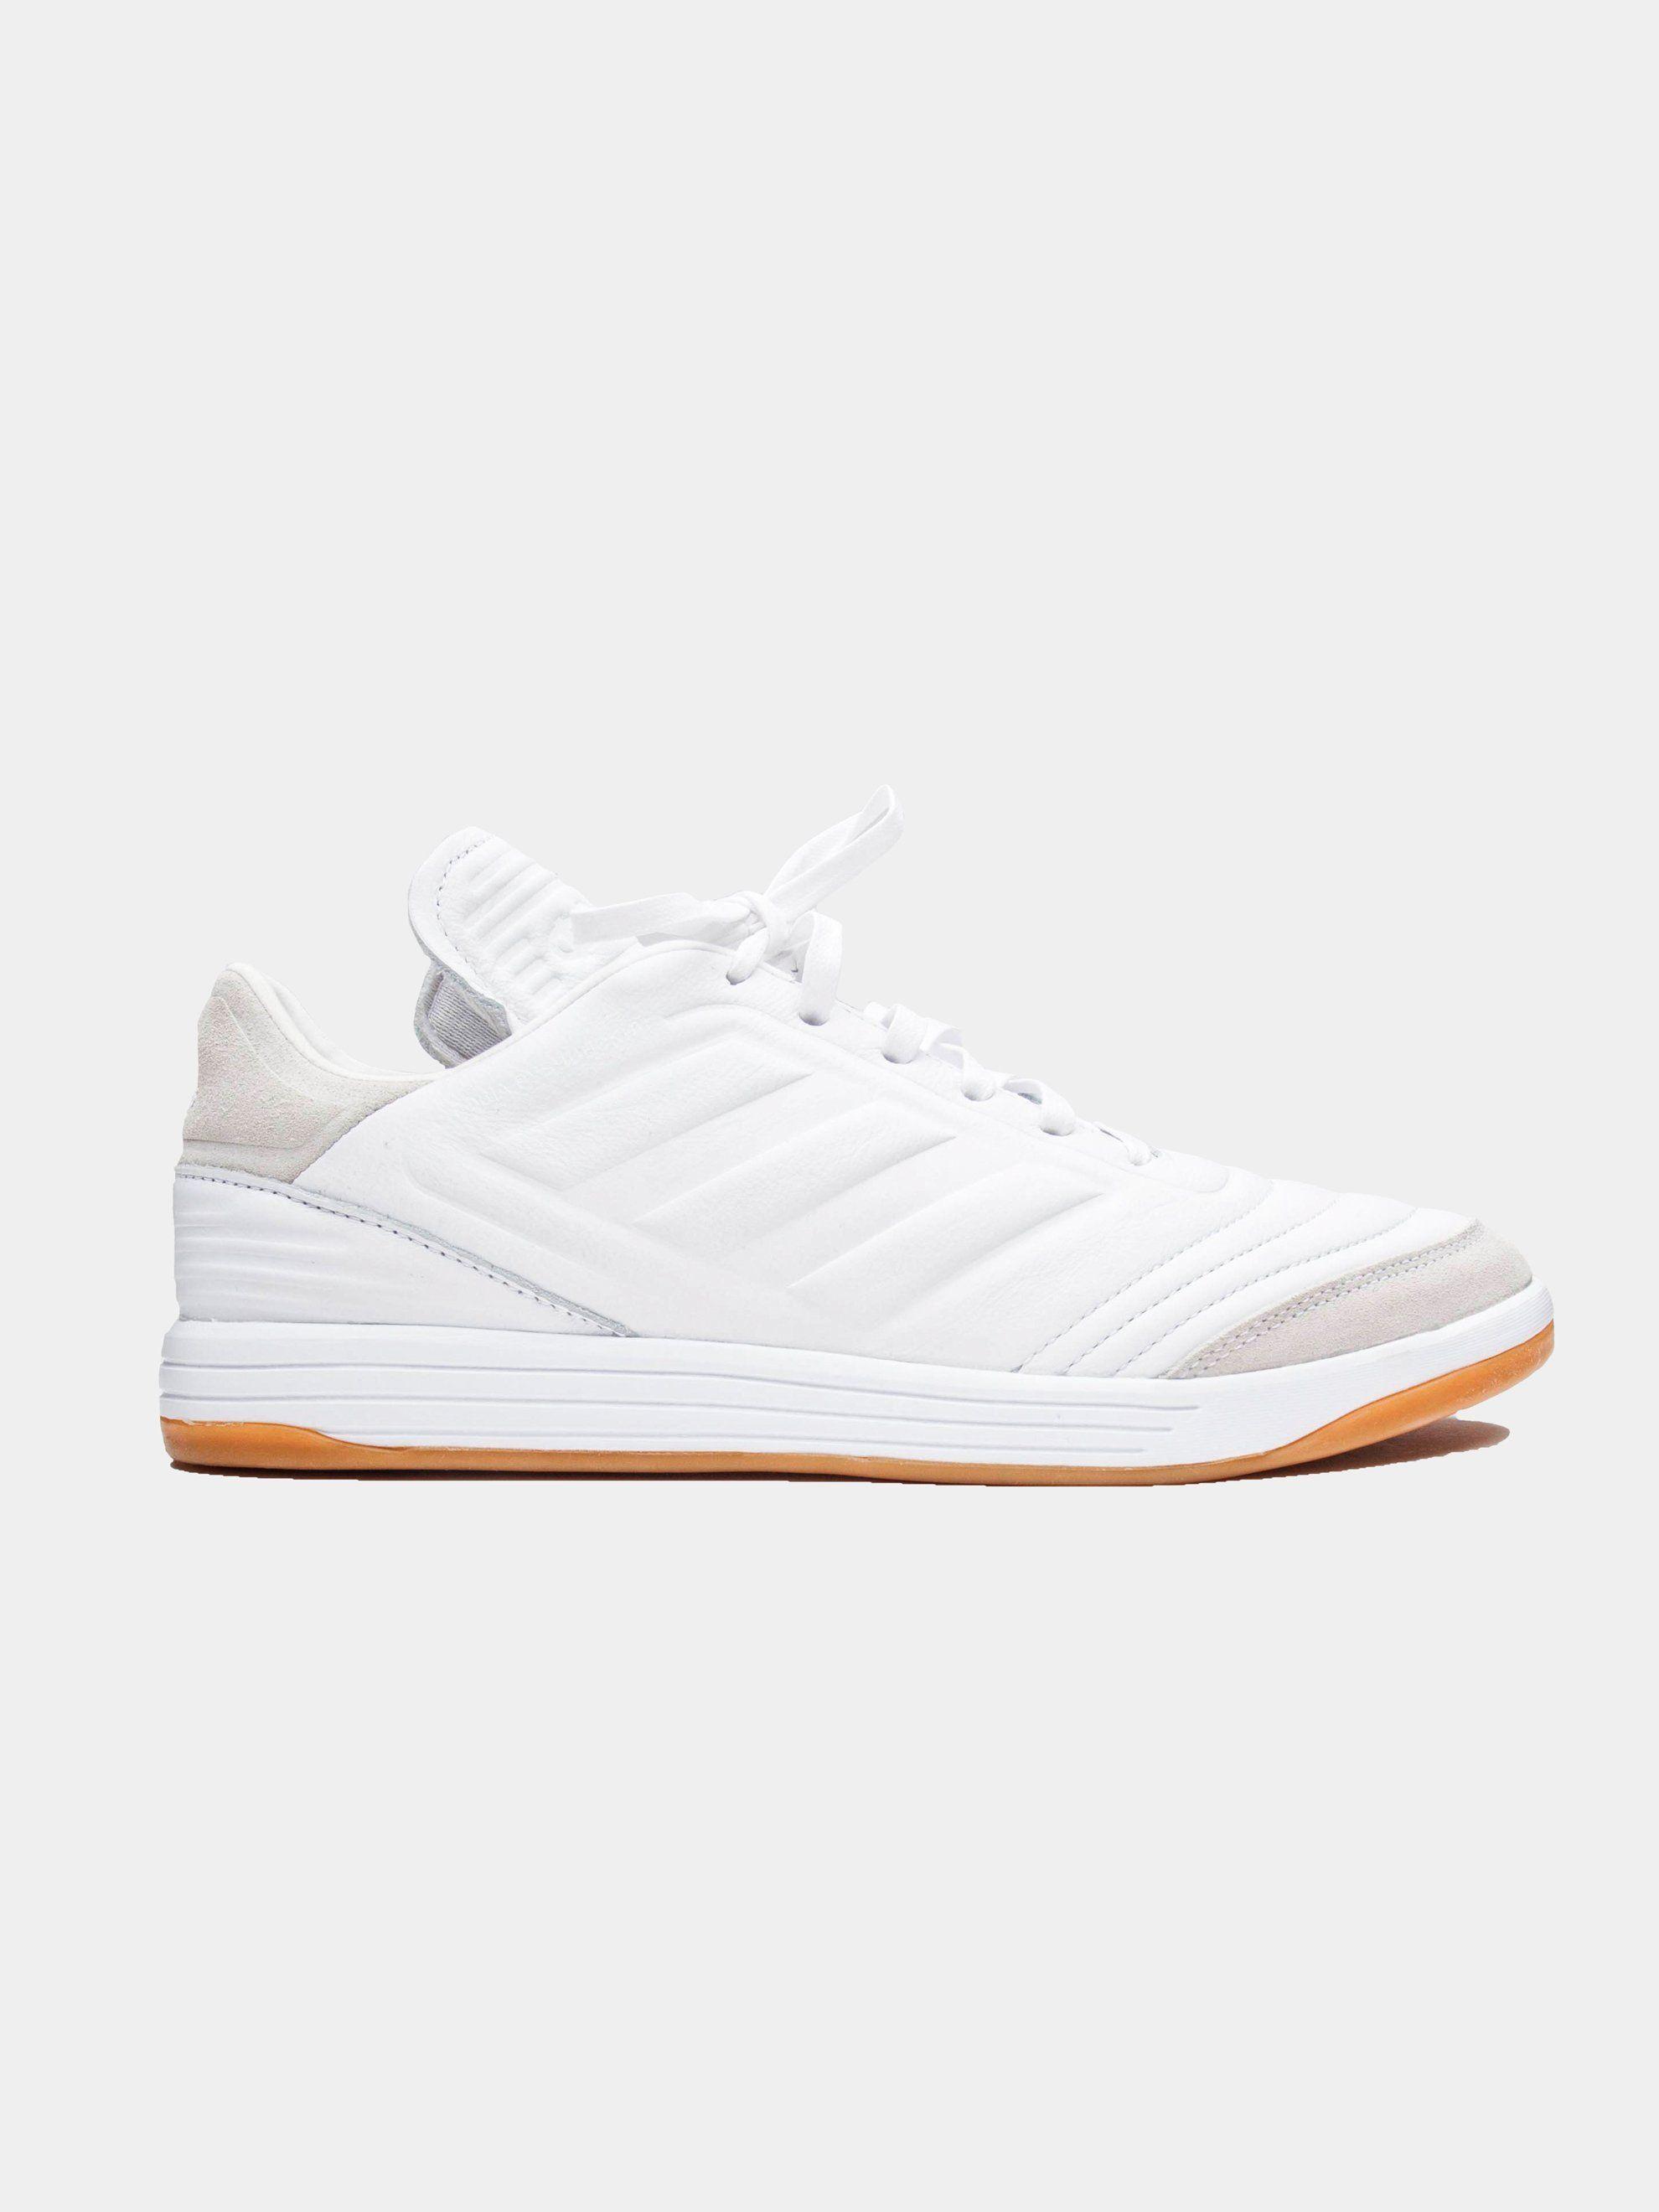 separation shoes e74c4 60f87 GOSHA RUBCHINSKIY - adidas Copa Trainer in White -  98.00 Zapatos De Fútbol,  Caprichosa,